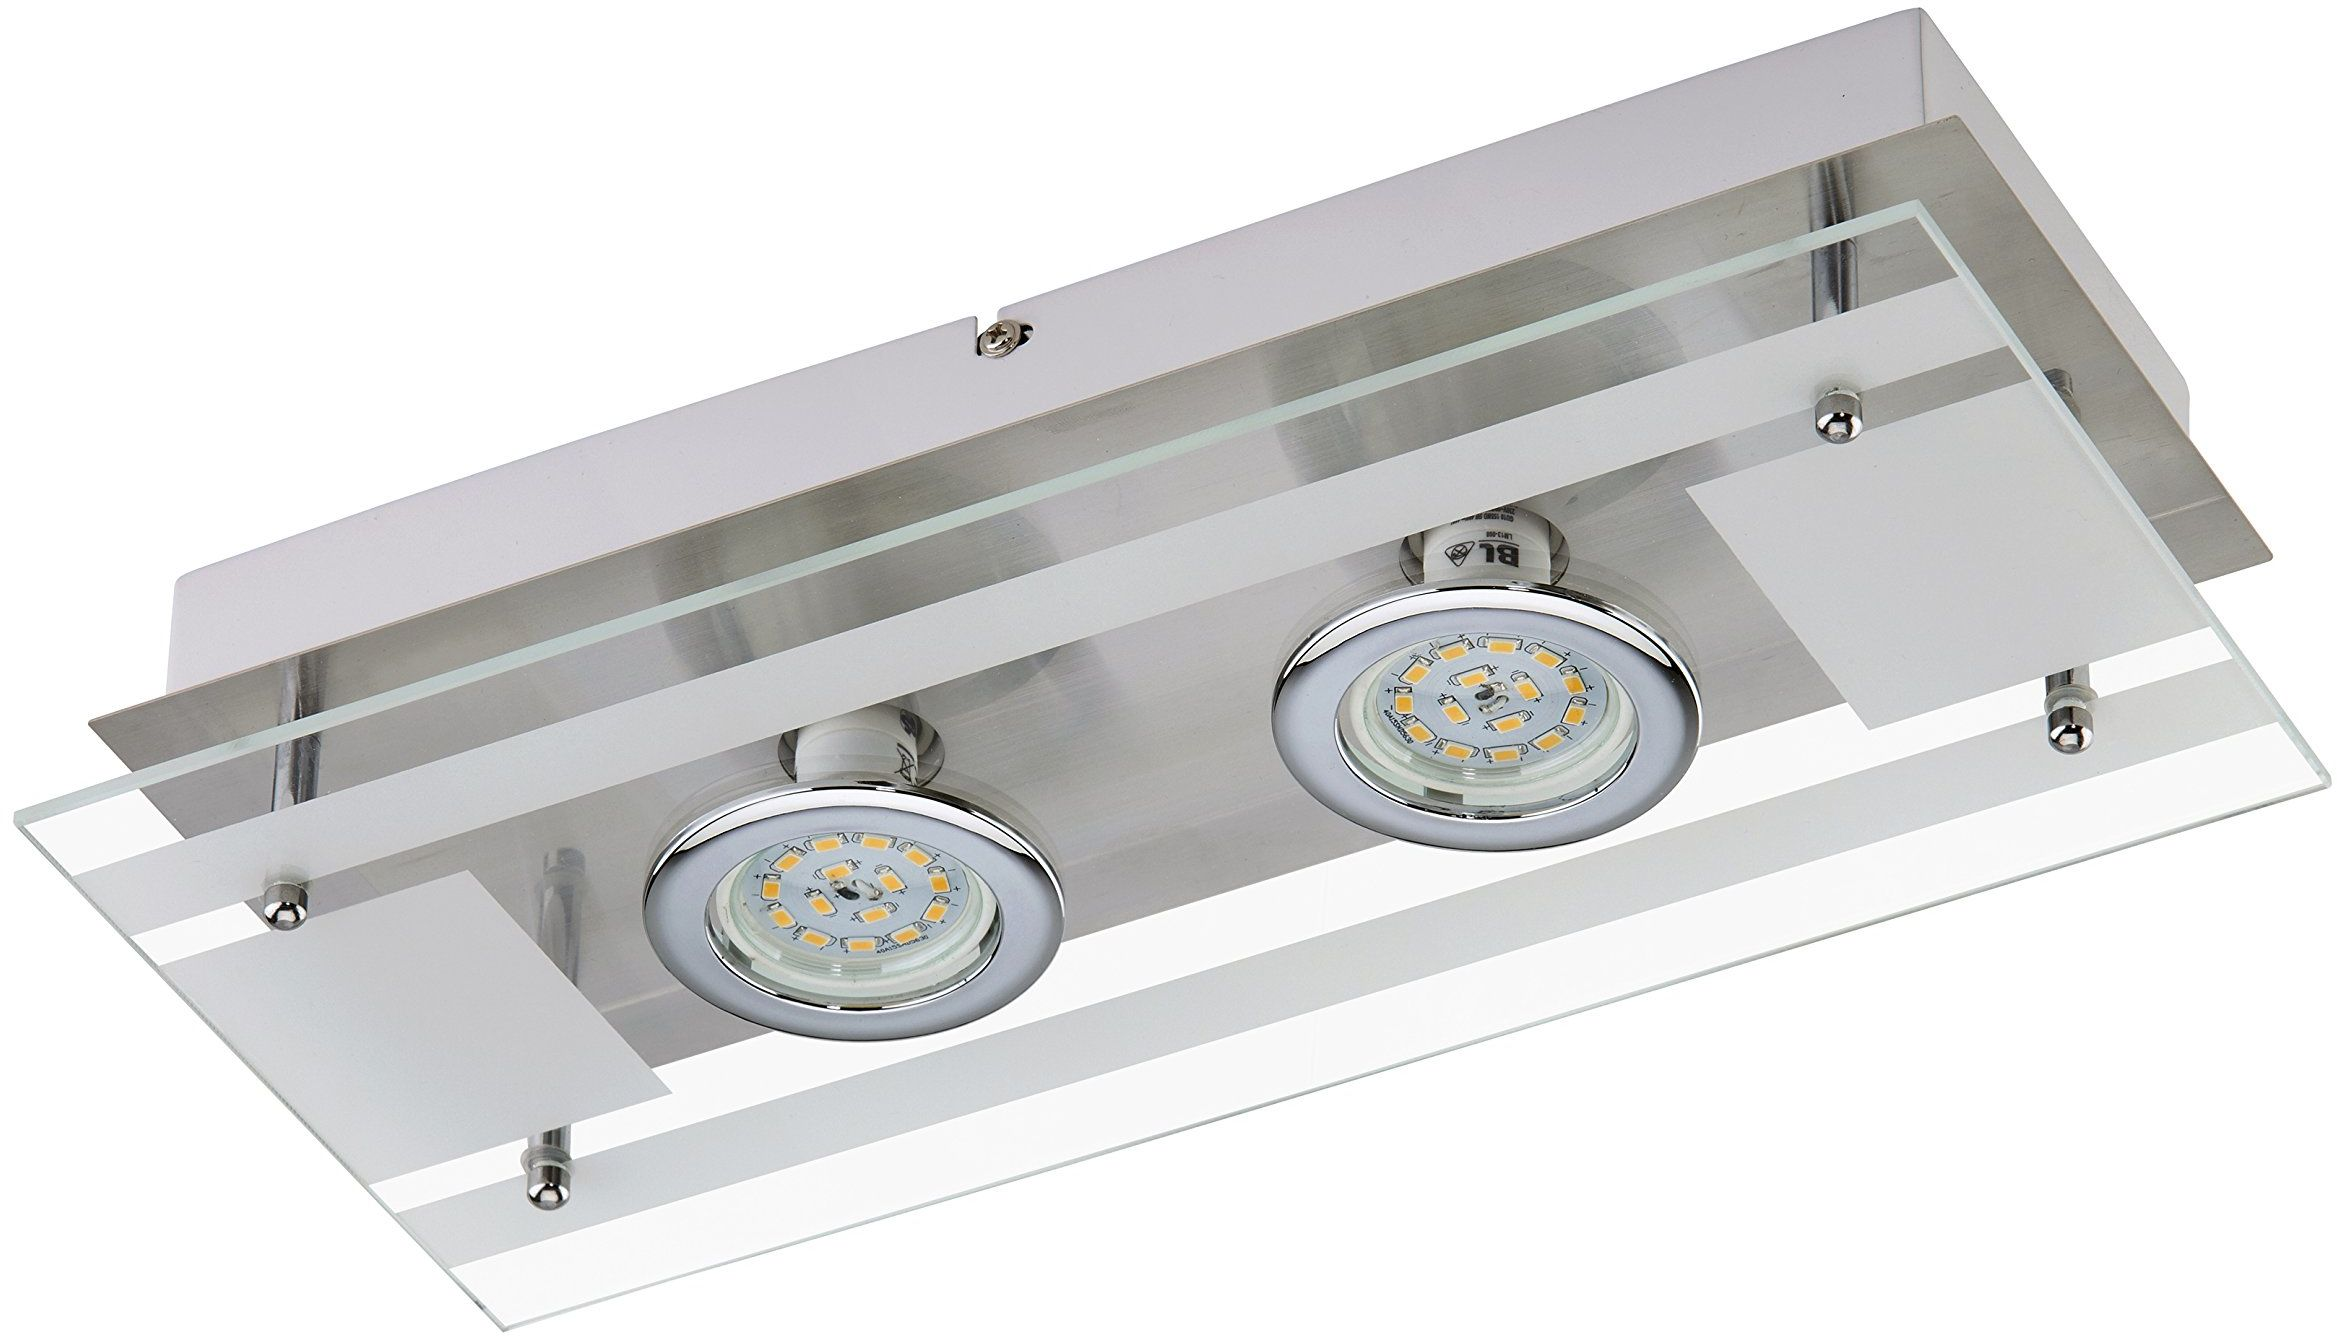 Briloner Leuchten Lampa ścienna LED 2 x 5 W, 400 lm, matowy nikiel 3552-022 2 37x17,5